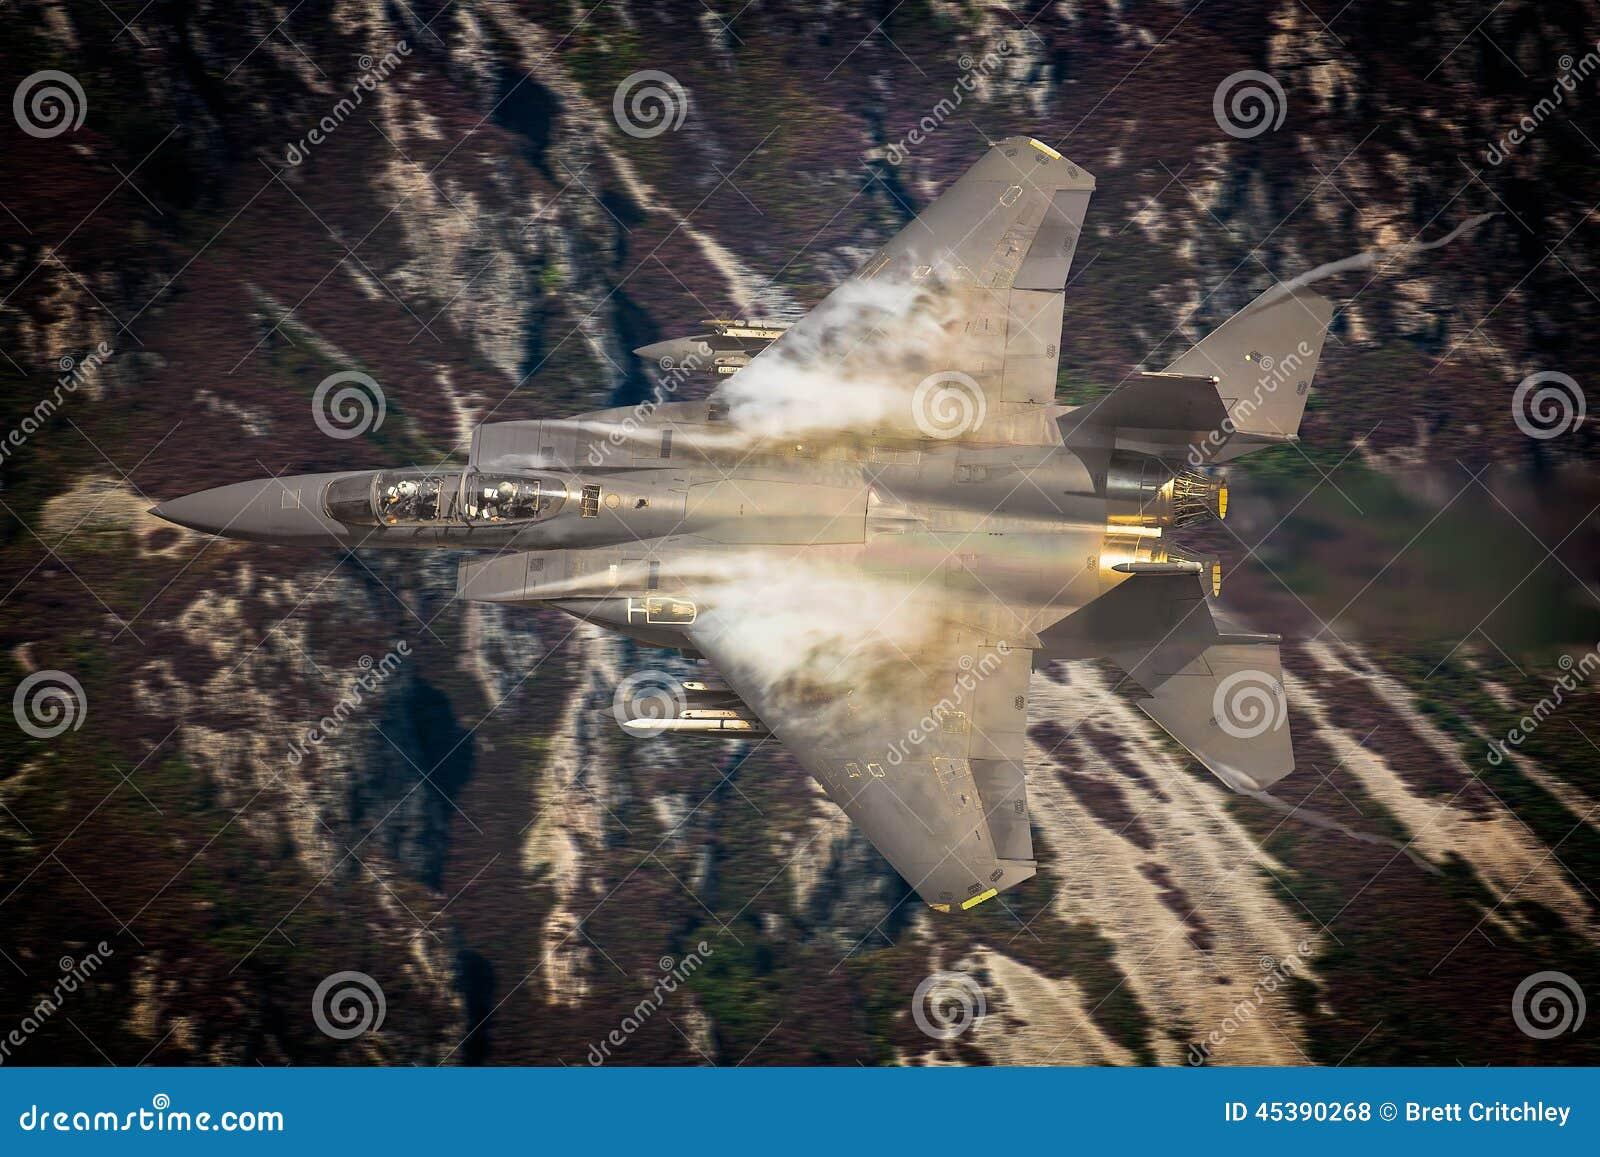 USAF F15 fighter jet